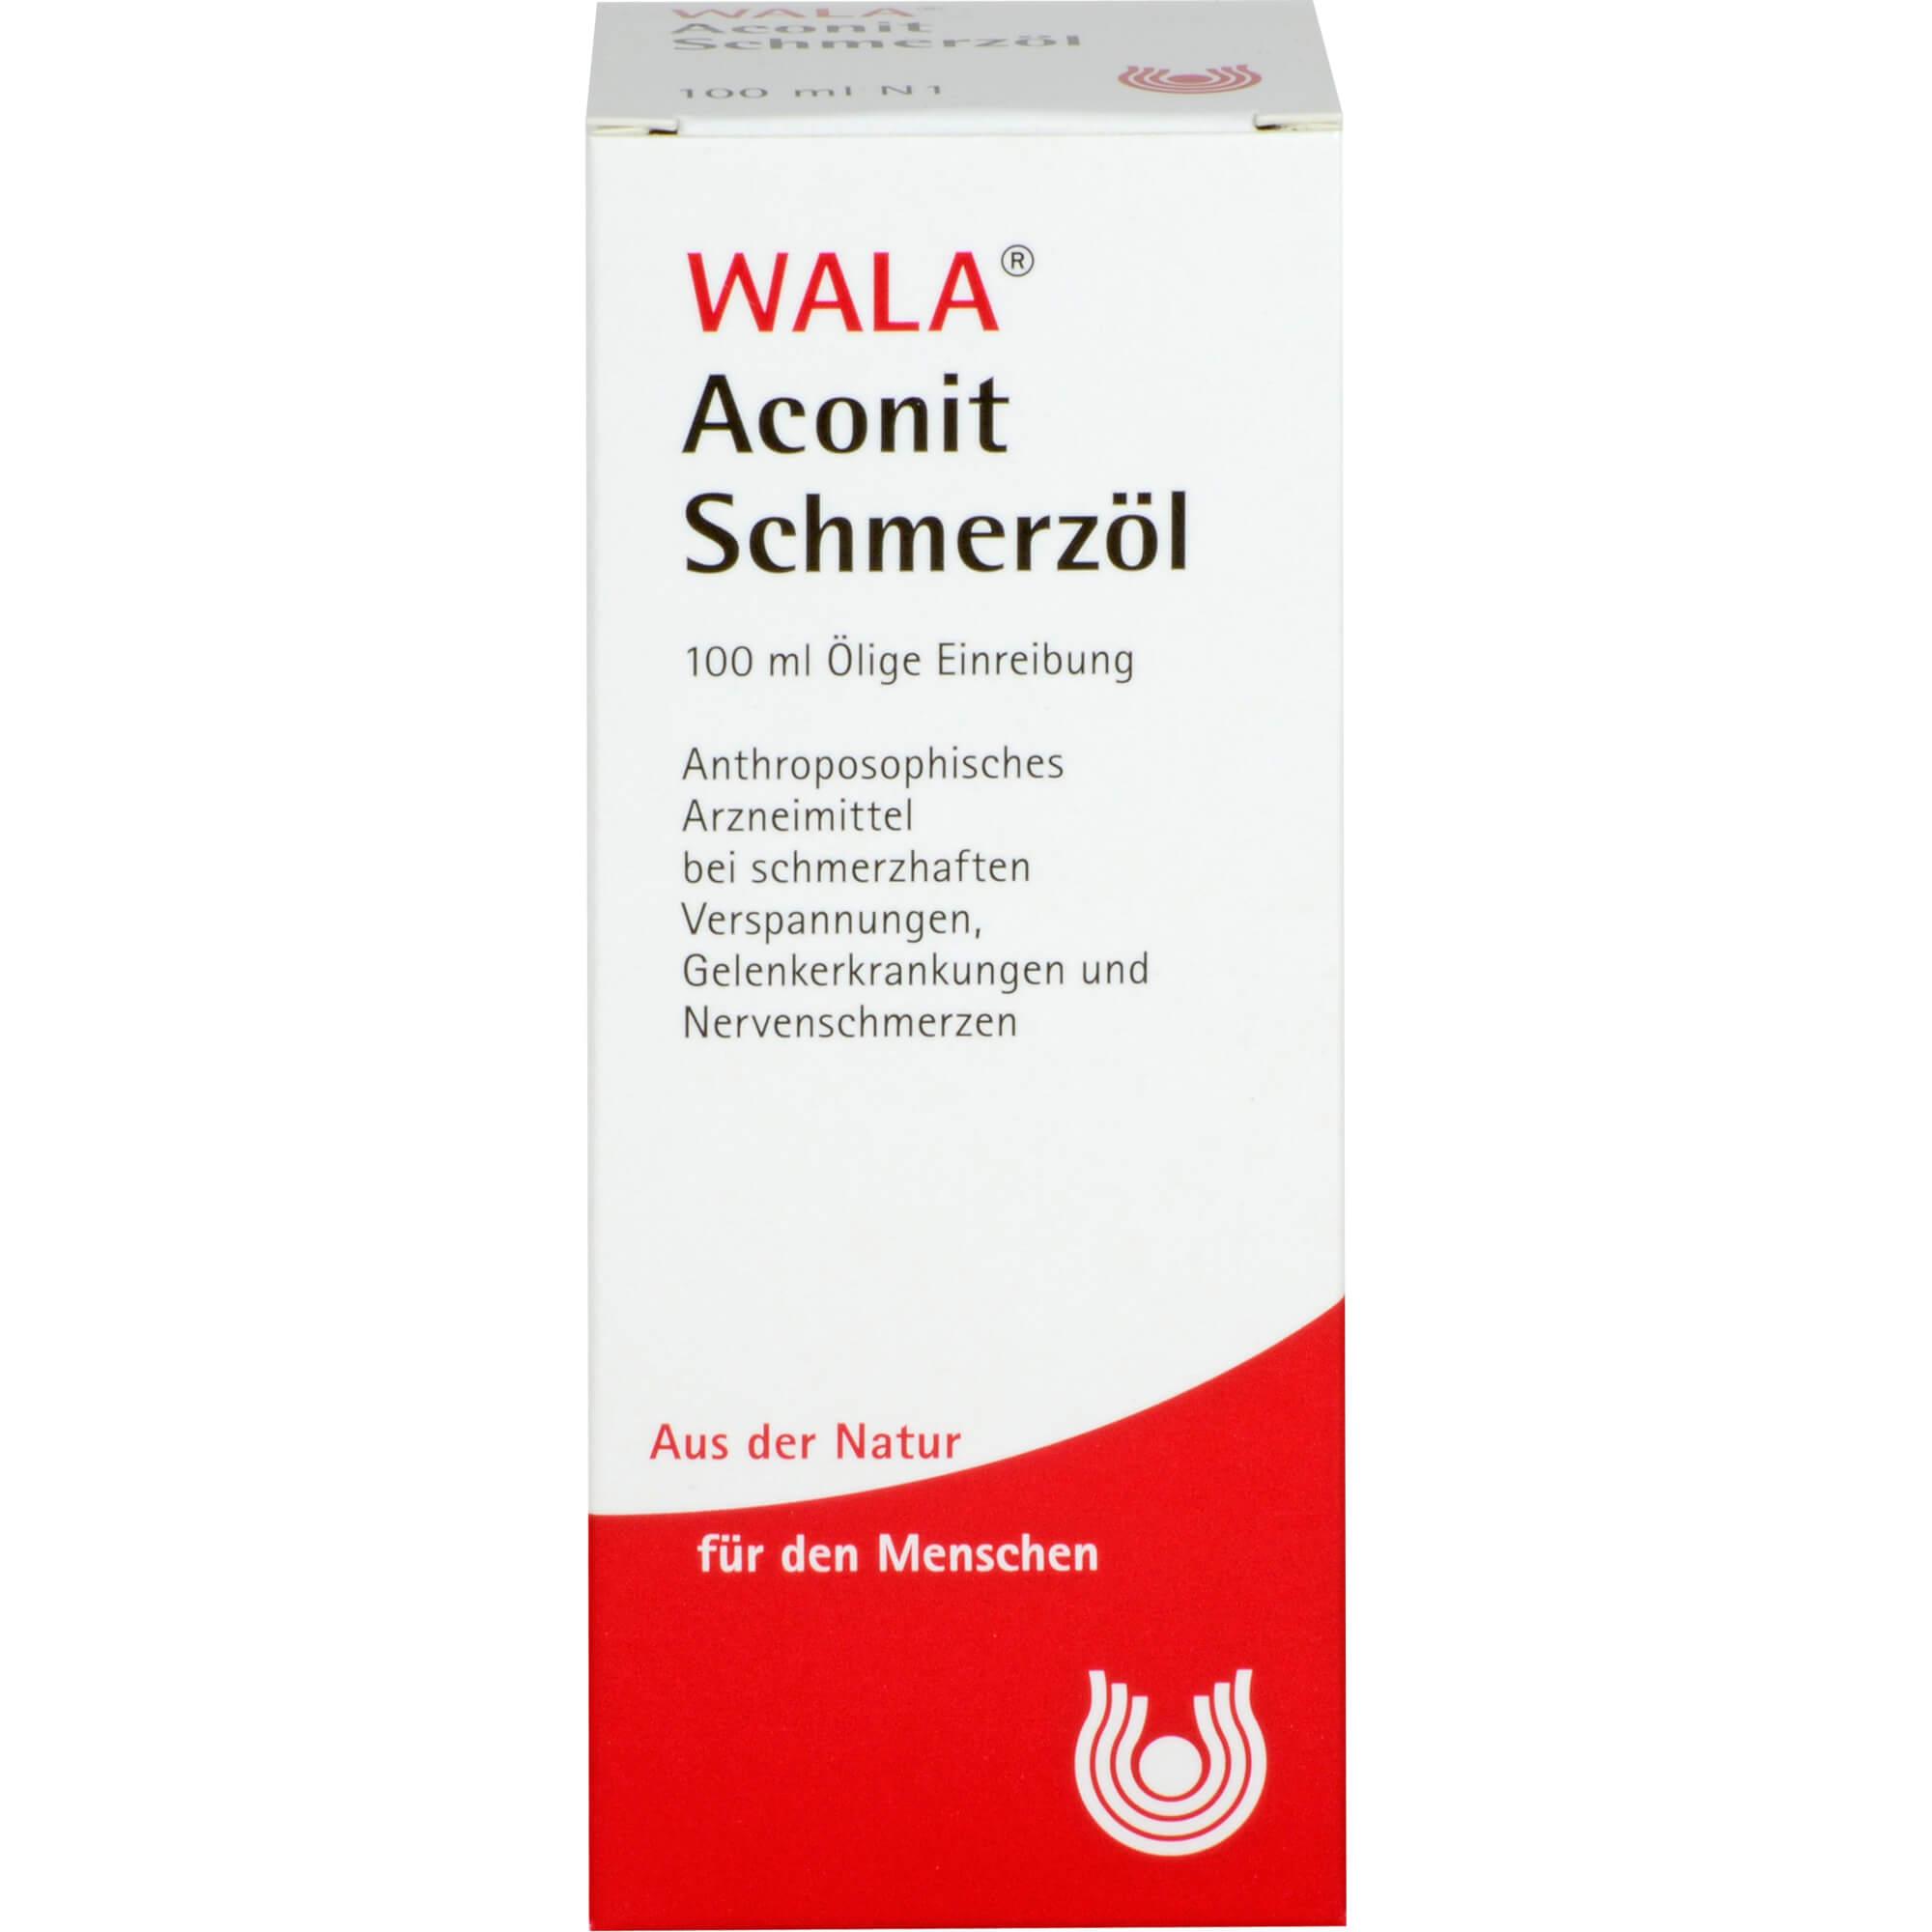 ACONIT-Schmerzoel